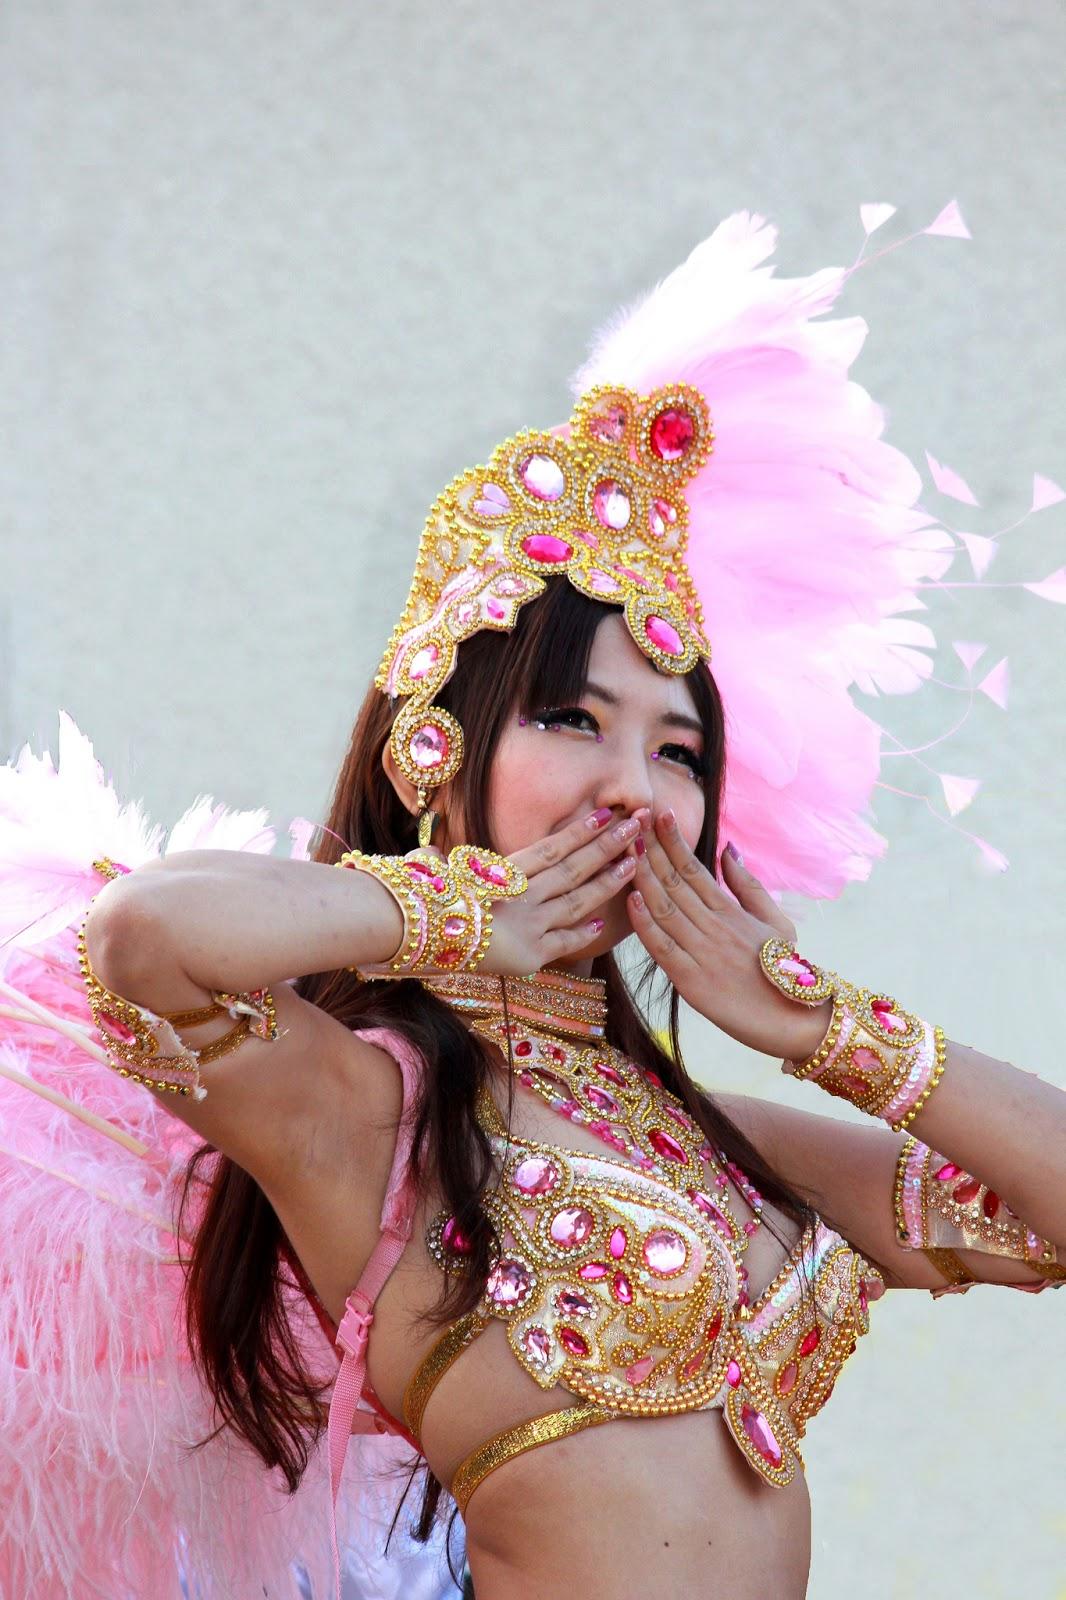 Samba dancer - This photo was taken on November 3, 2012 using a Canon EOS Kiss X4, by tanakawho.